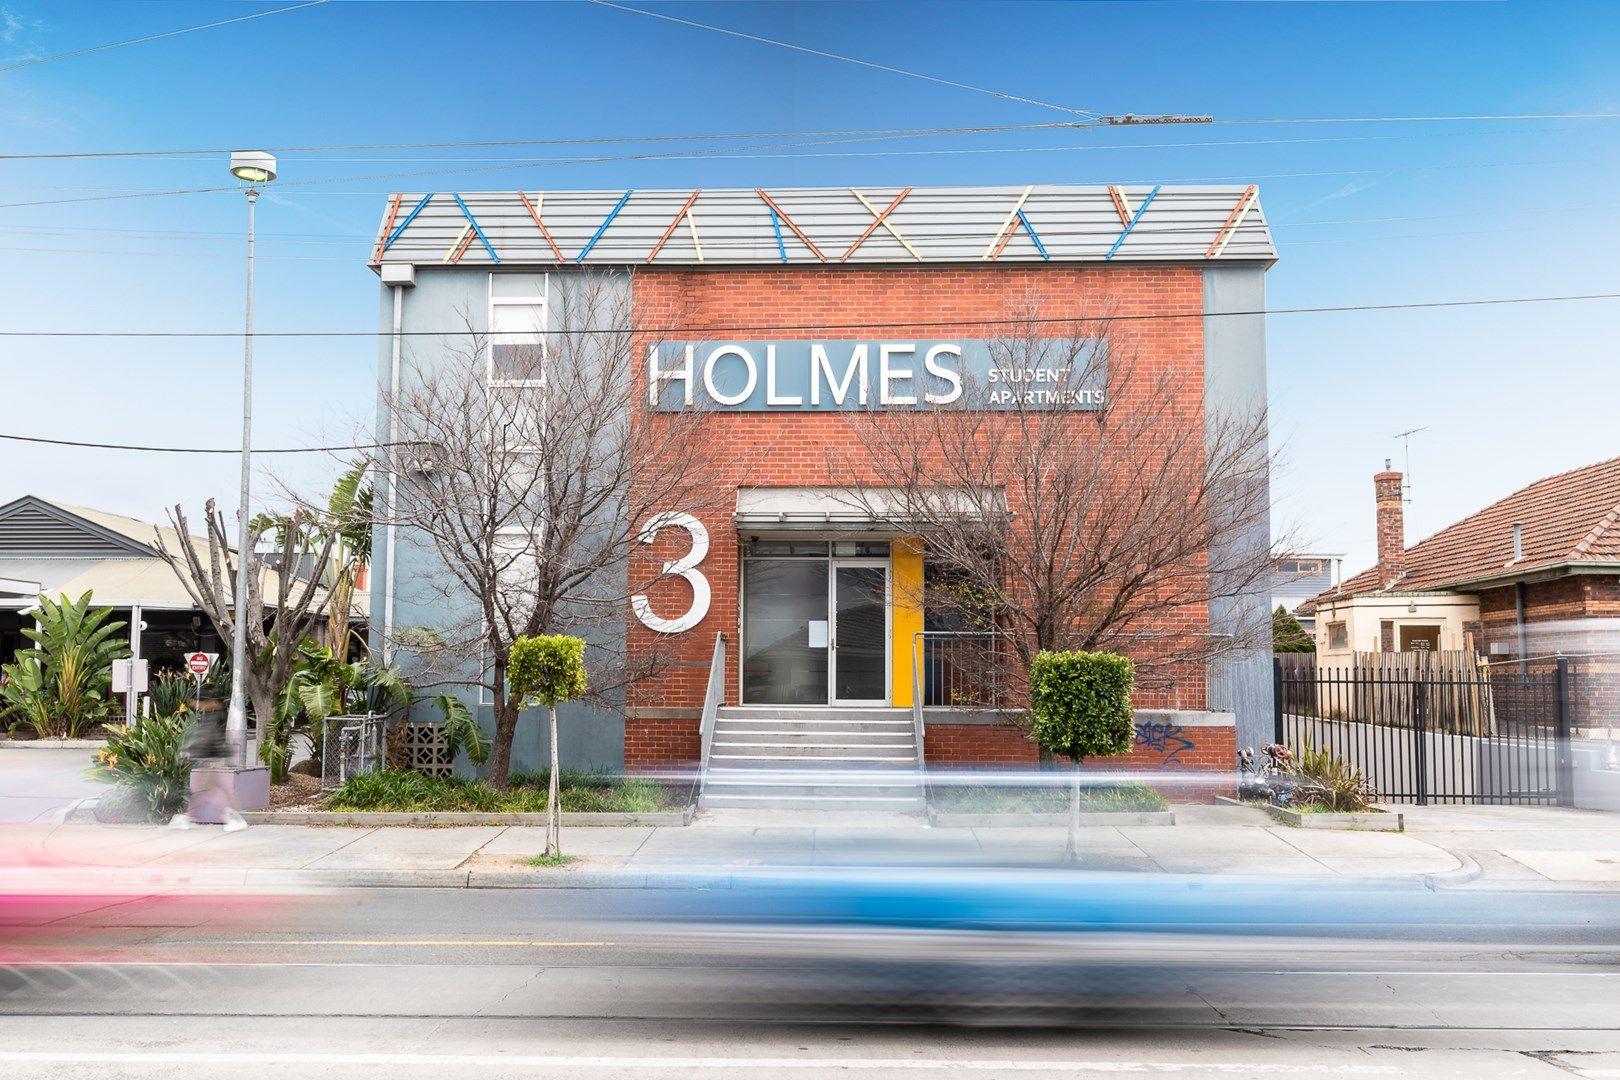 30/3 Holmes Street, Brunswick East VIC 3057, Image 0